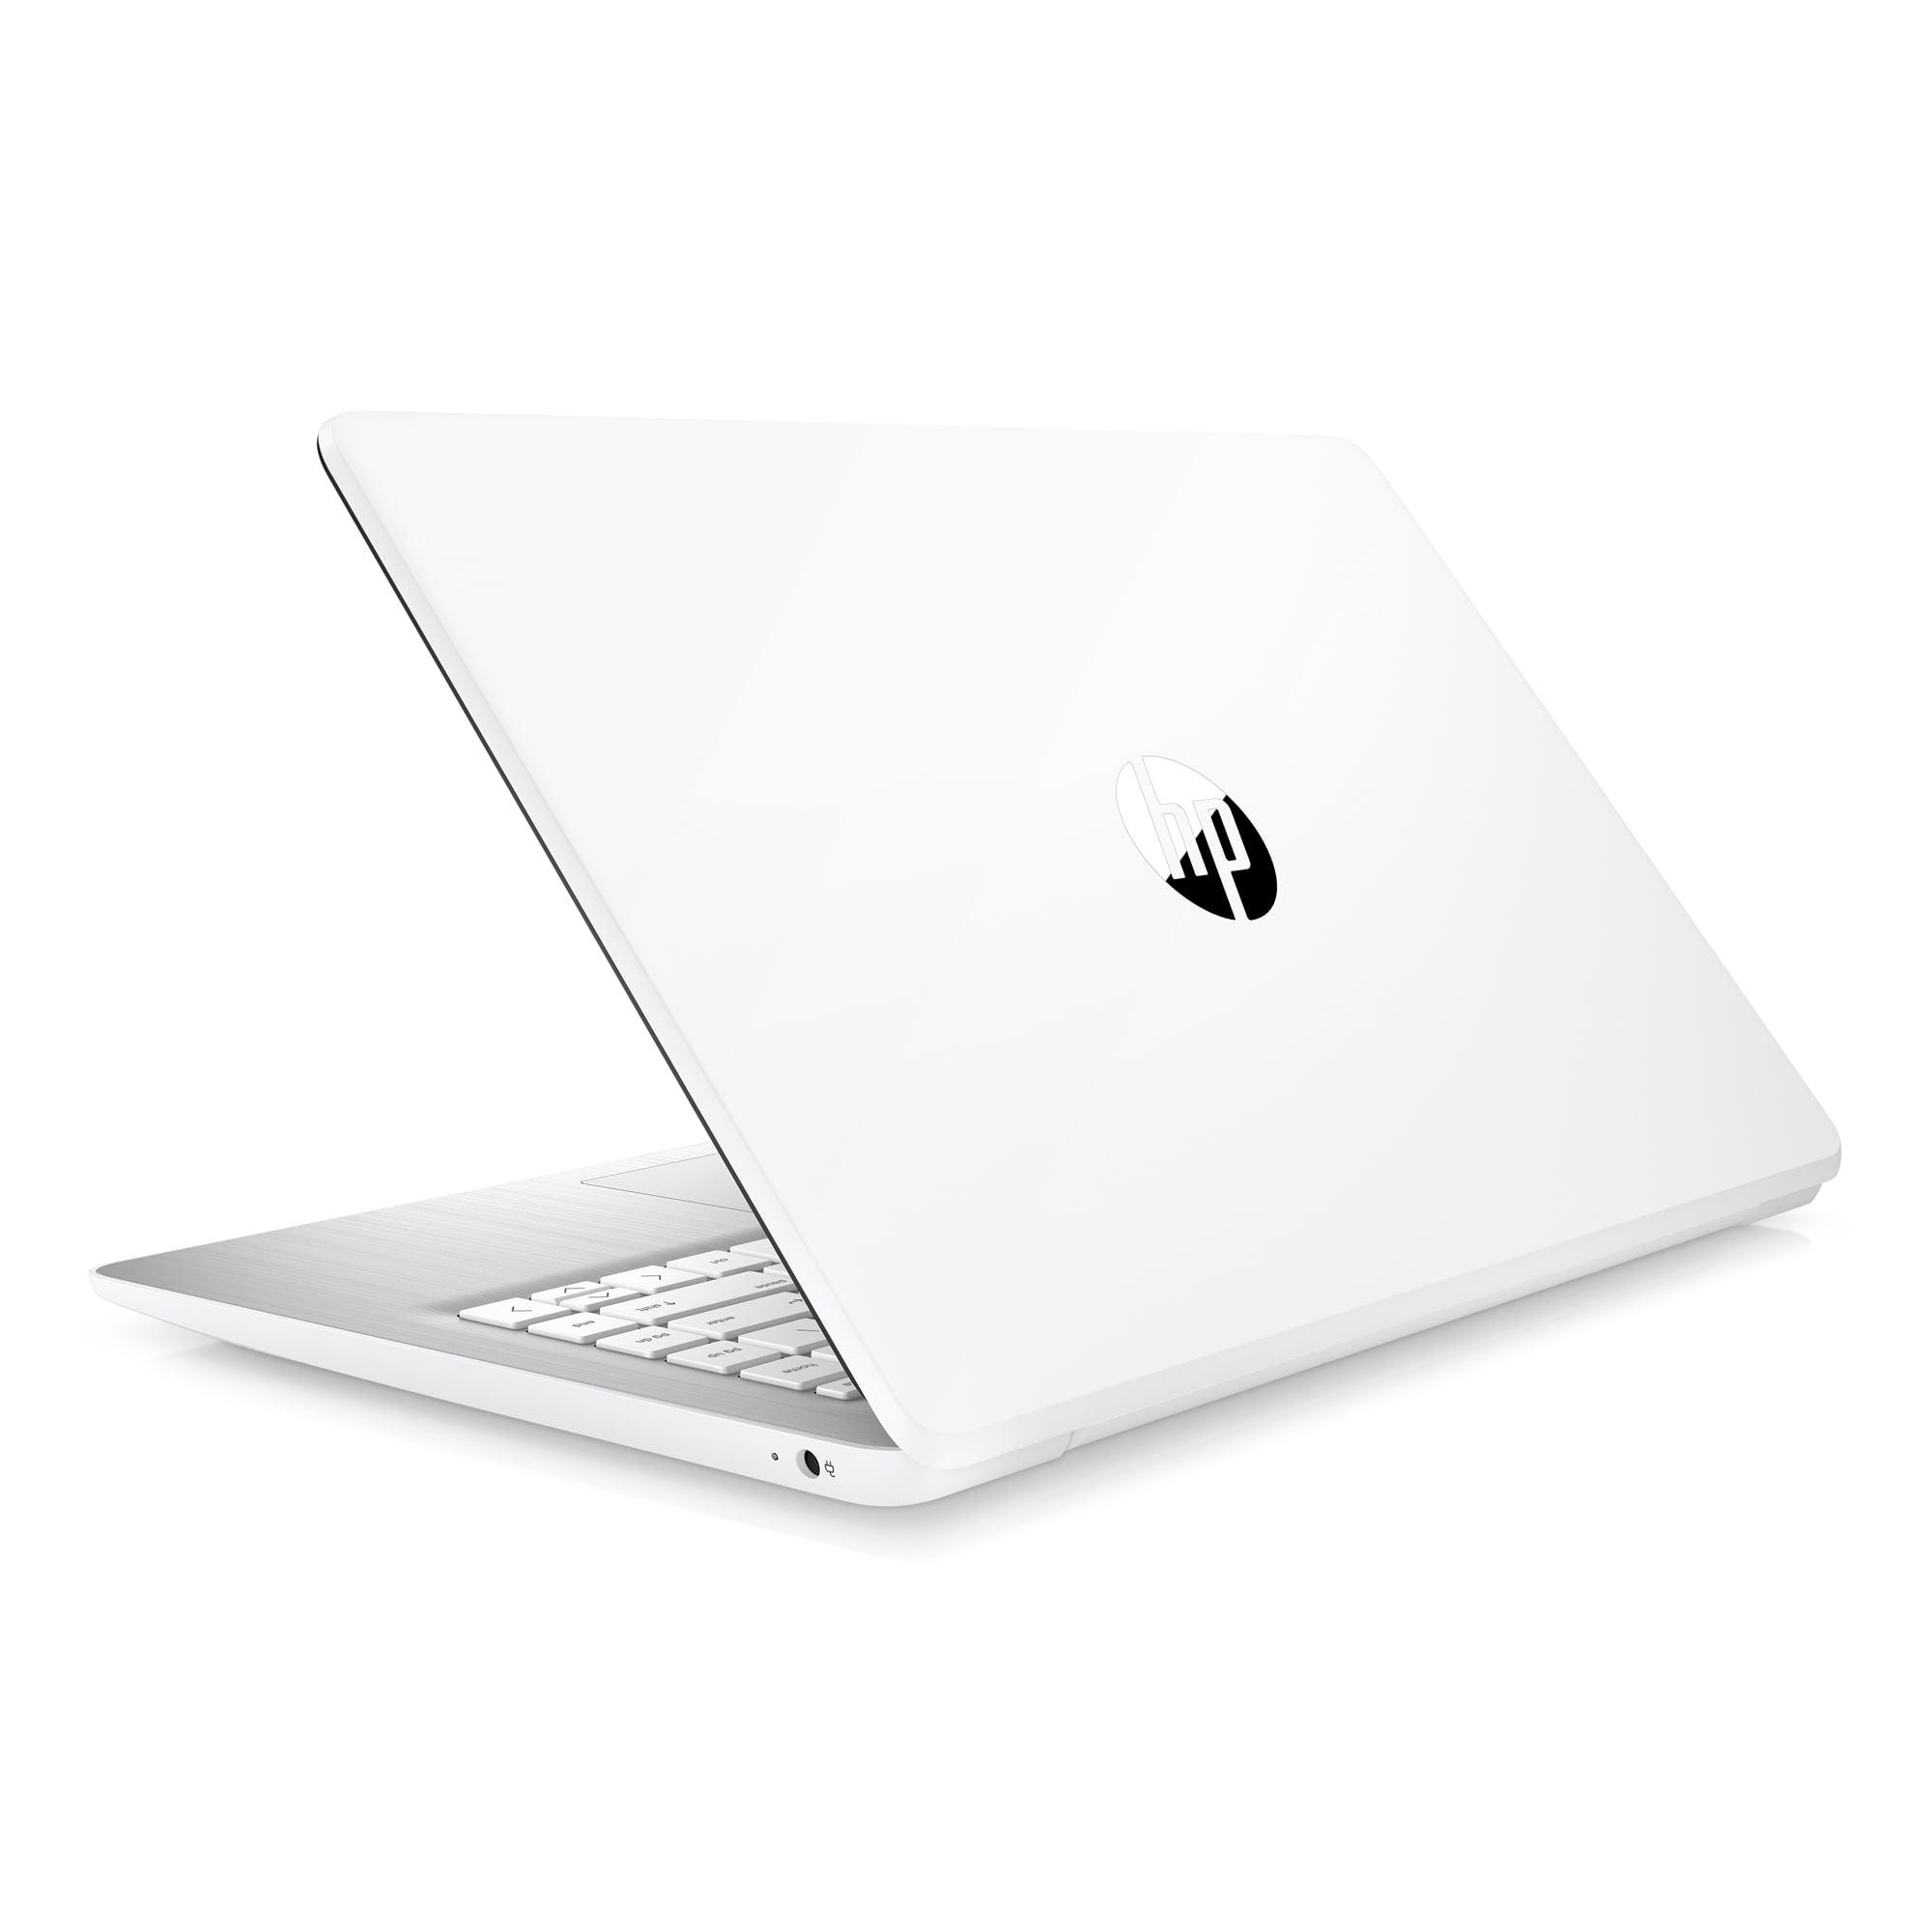 Hp Stream Laptop 14 Ds0070nr Amd Dual Core A4 9120e 4gb Ddr4 64gb Emmc Amd Radeon R3 Graphics Windows 10 Home In S Mode Diamond White And Dove Silver Walmart Com Walmart Com